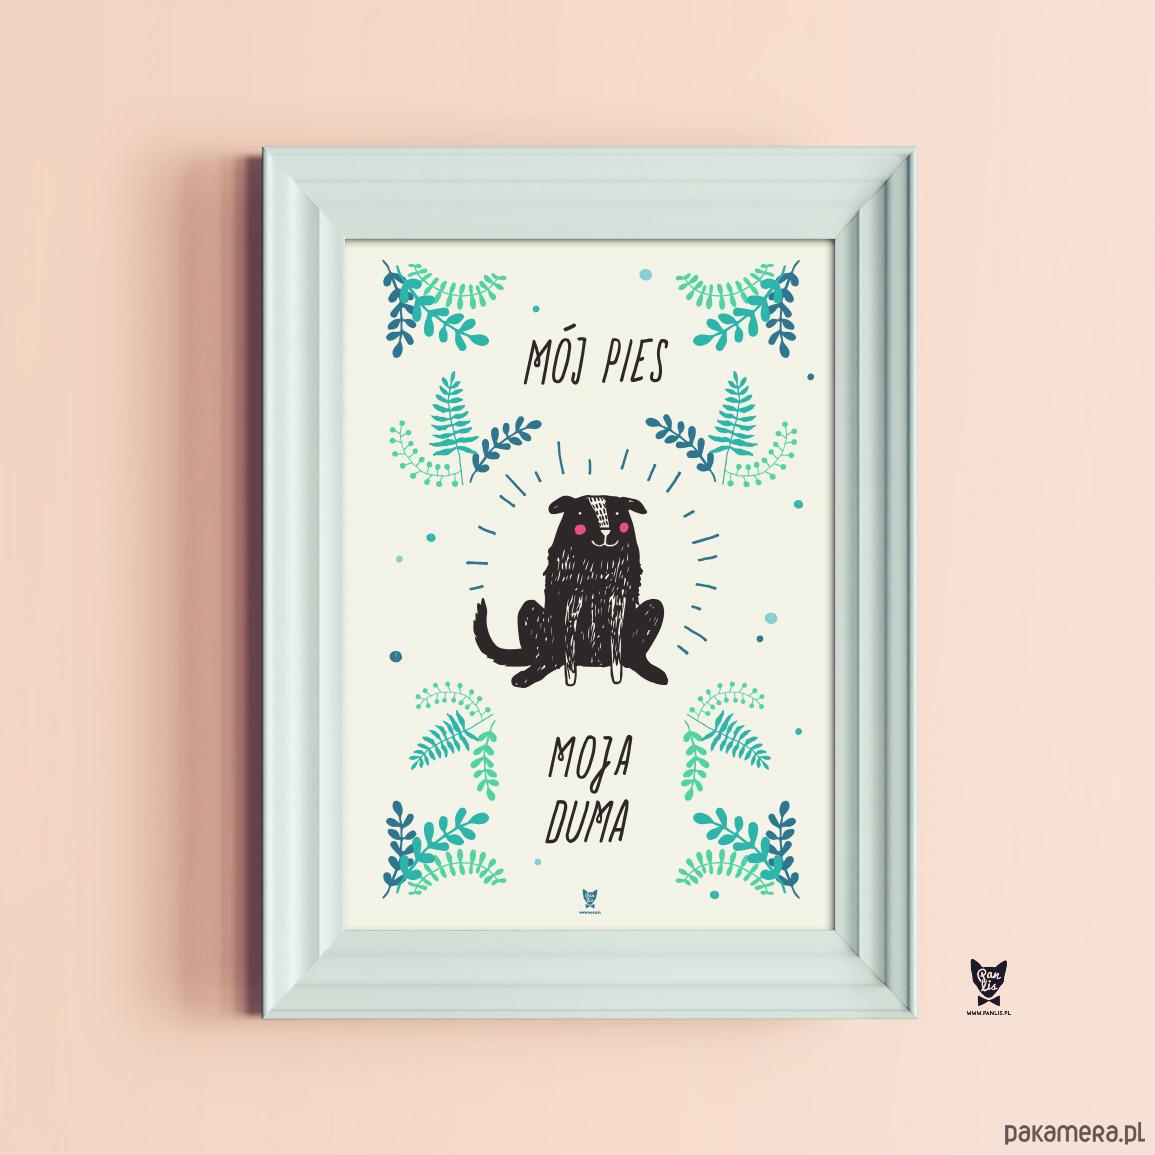 Plakat Dla Psiarzy Mój Pies Moja Duma A2 Pakamerapl